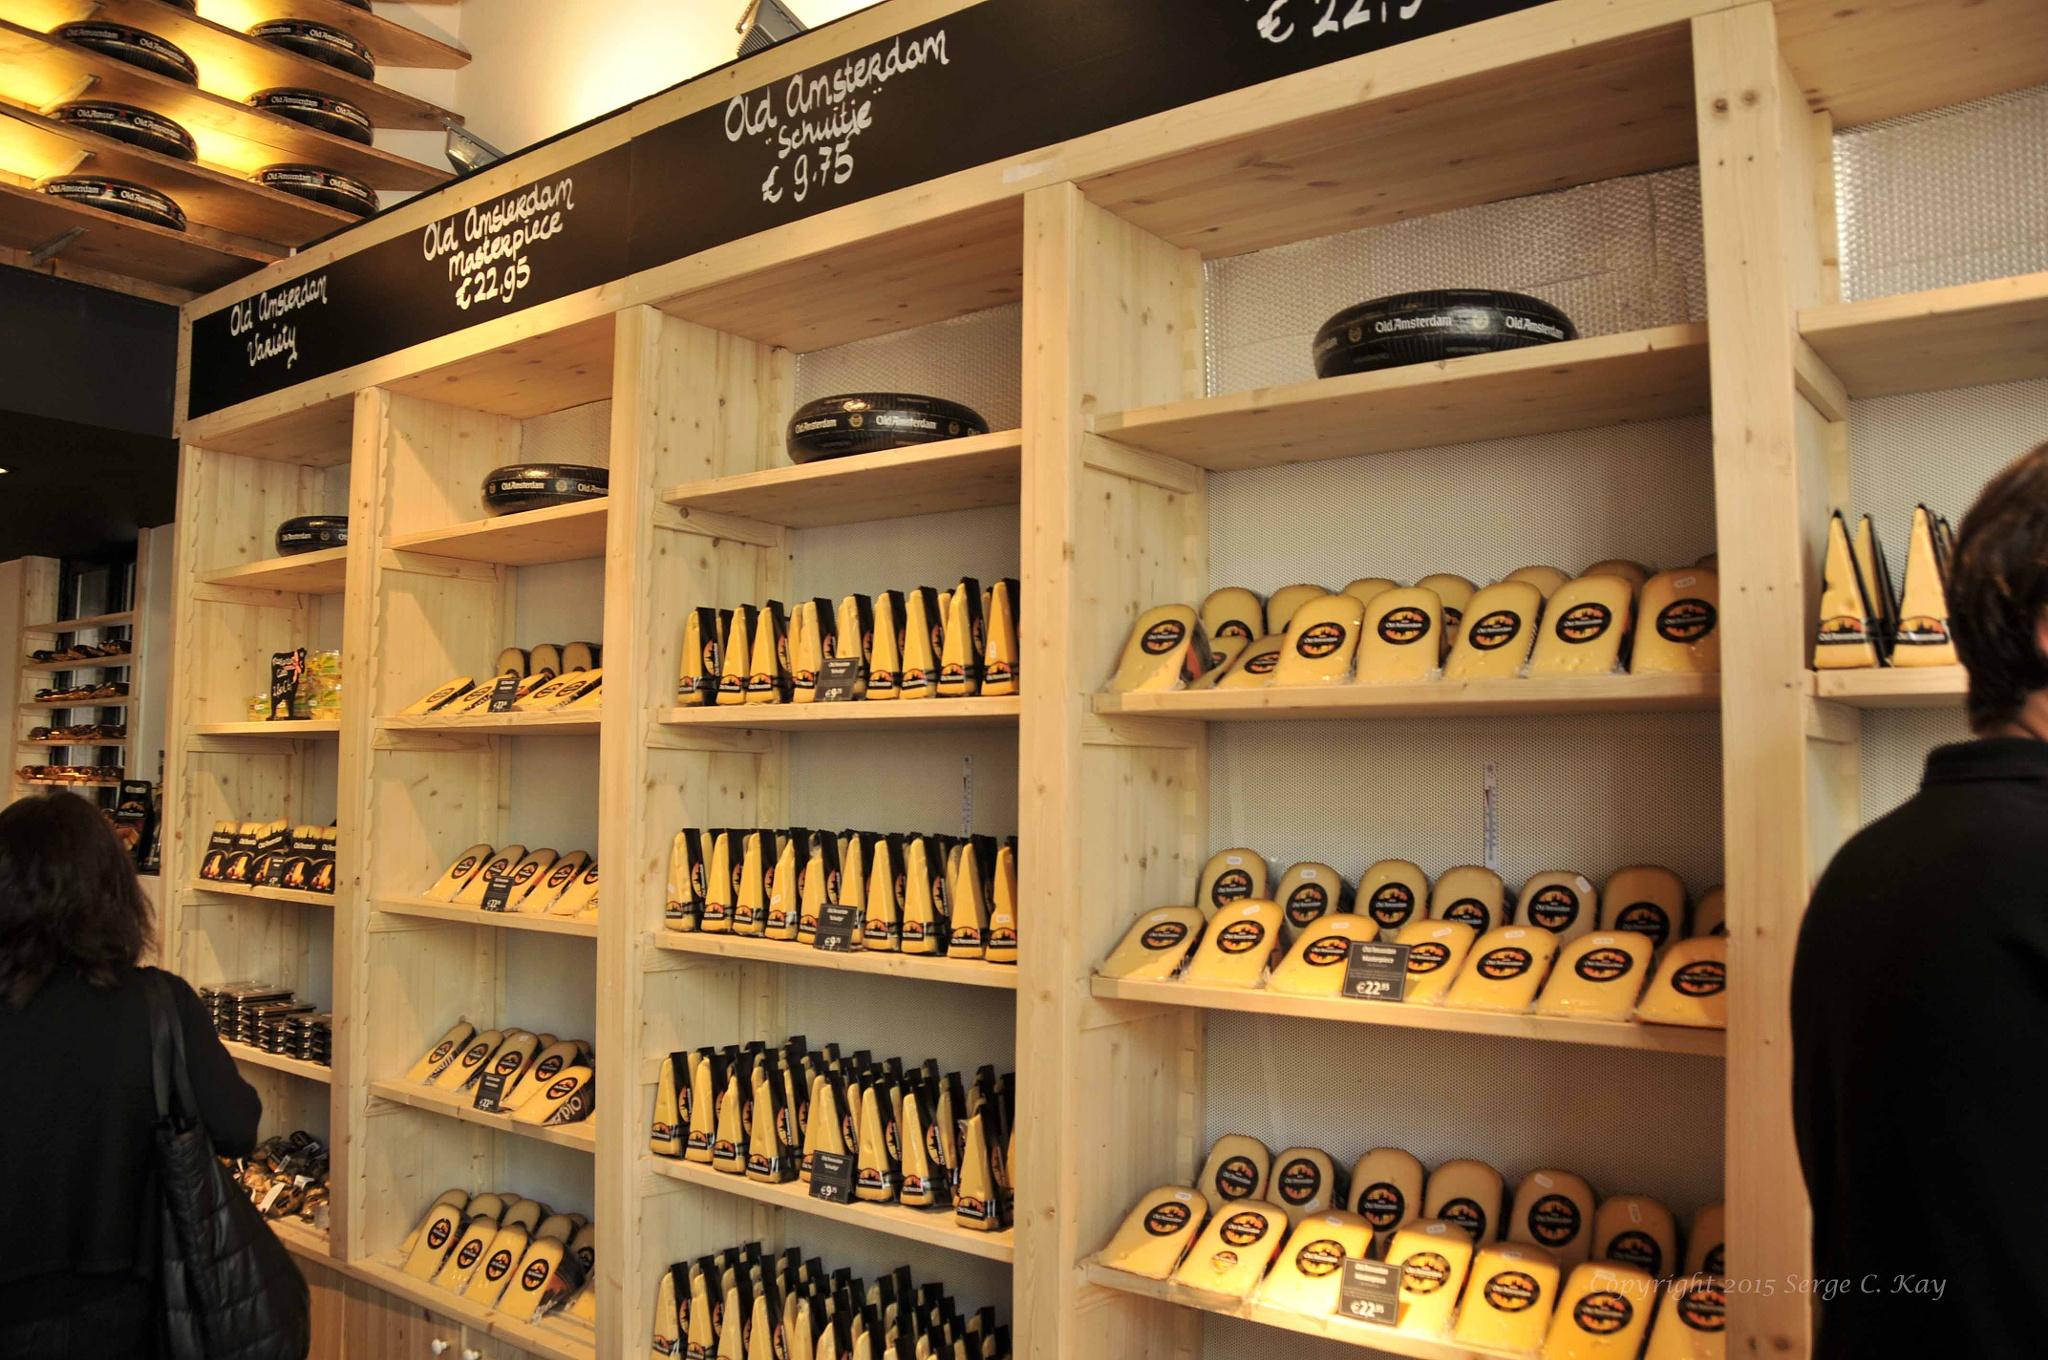 Amsterdam Gouda Cheese Shop by Serge Kay